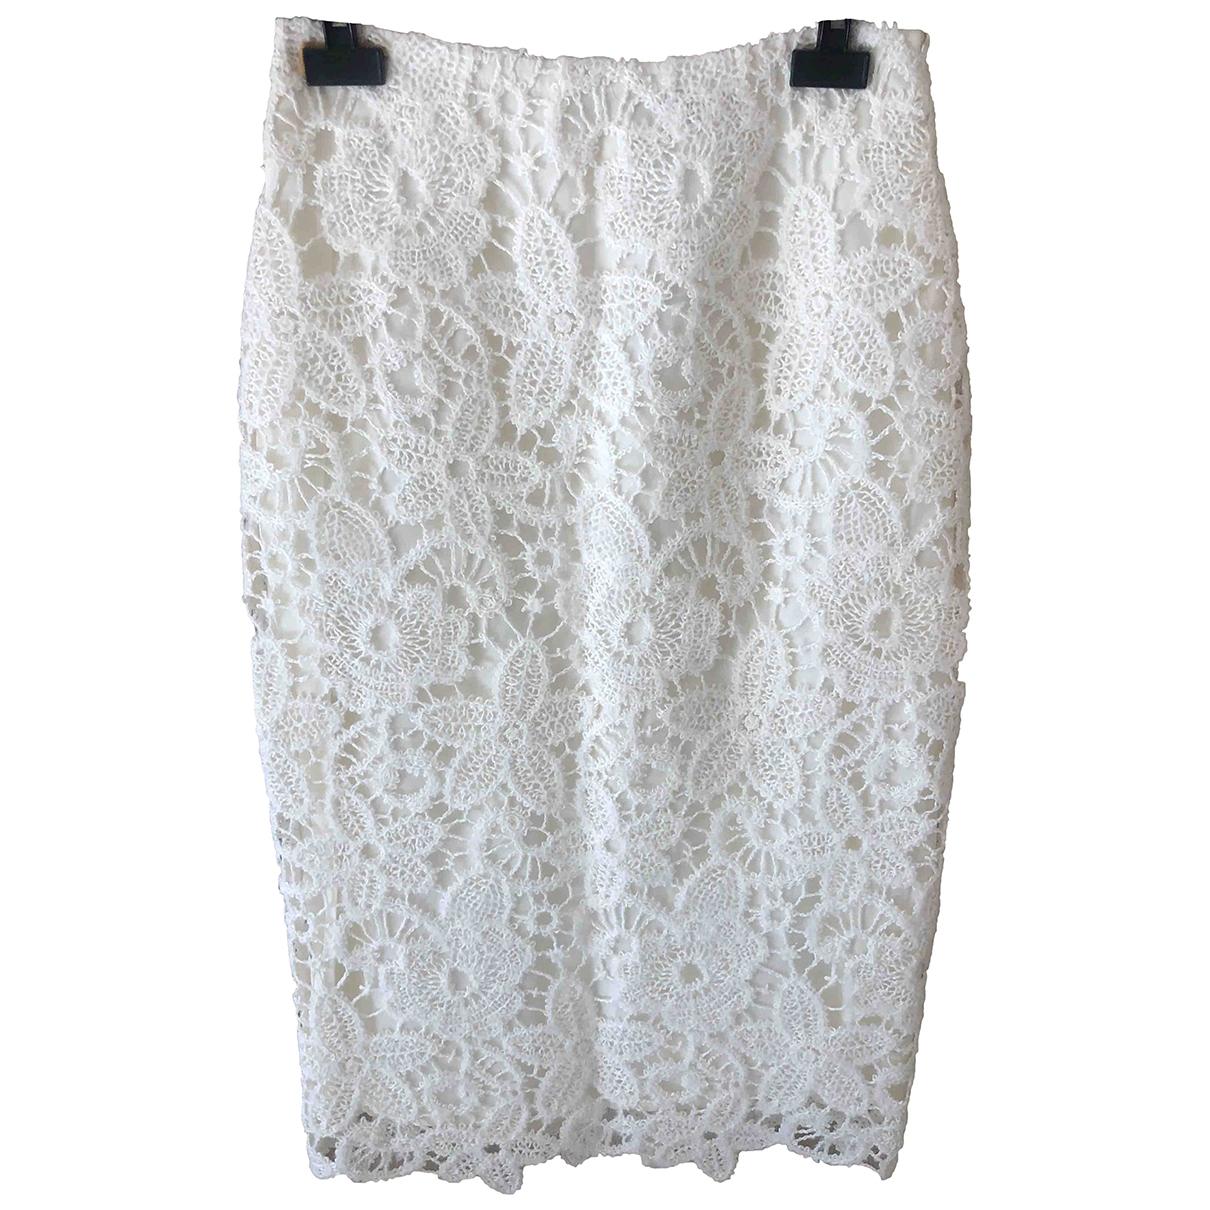 Ermanno Scervino \N Beige Wool skirt for Women 40 IT